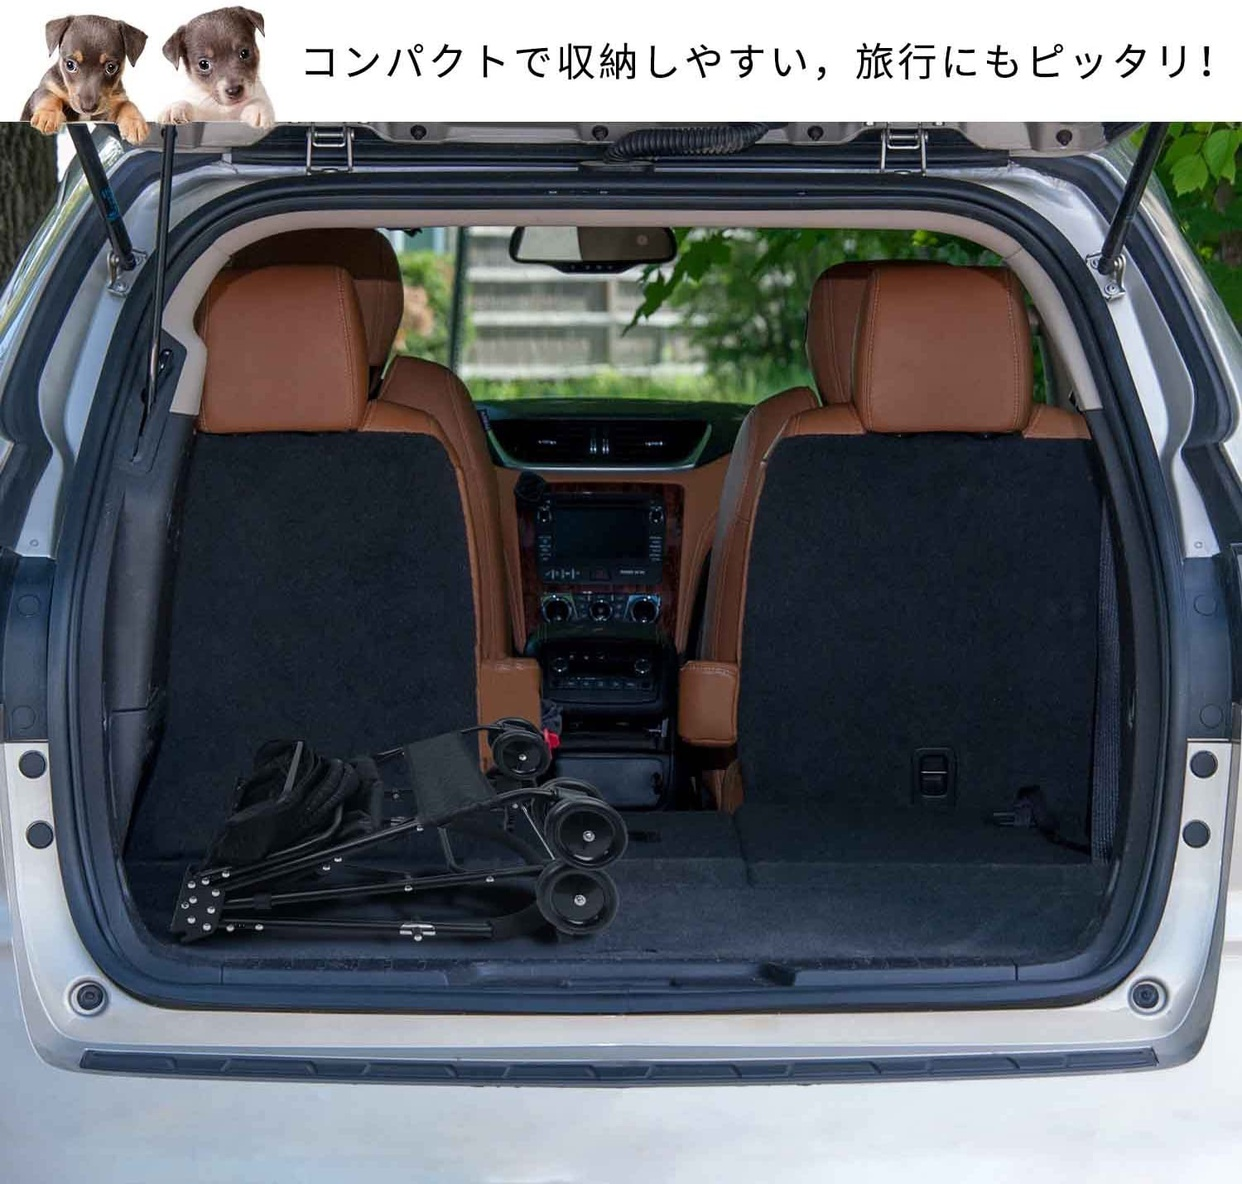 Dopet 4輪タイプ ミニペットカートの商品画像9